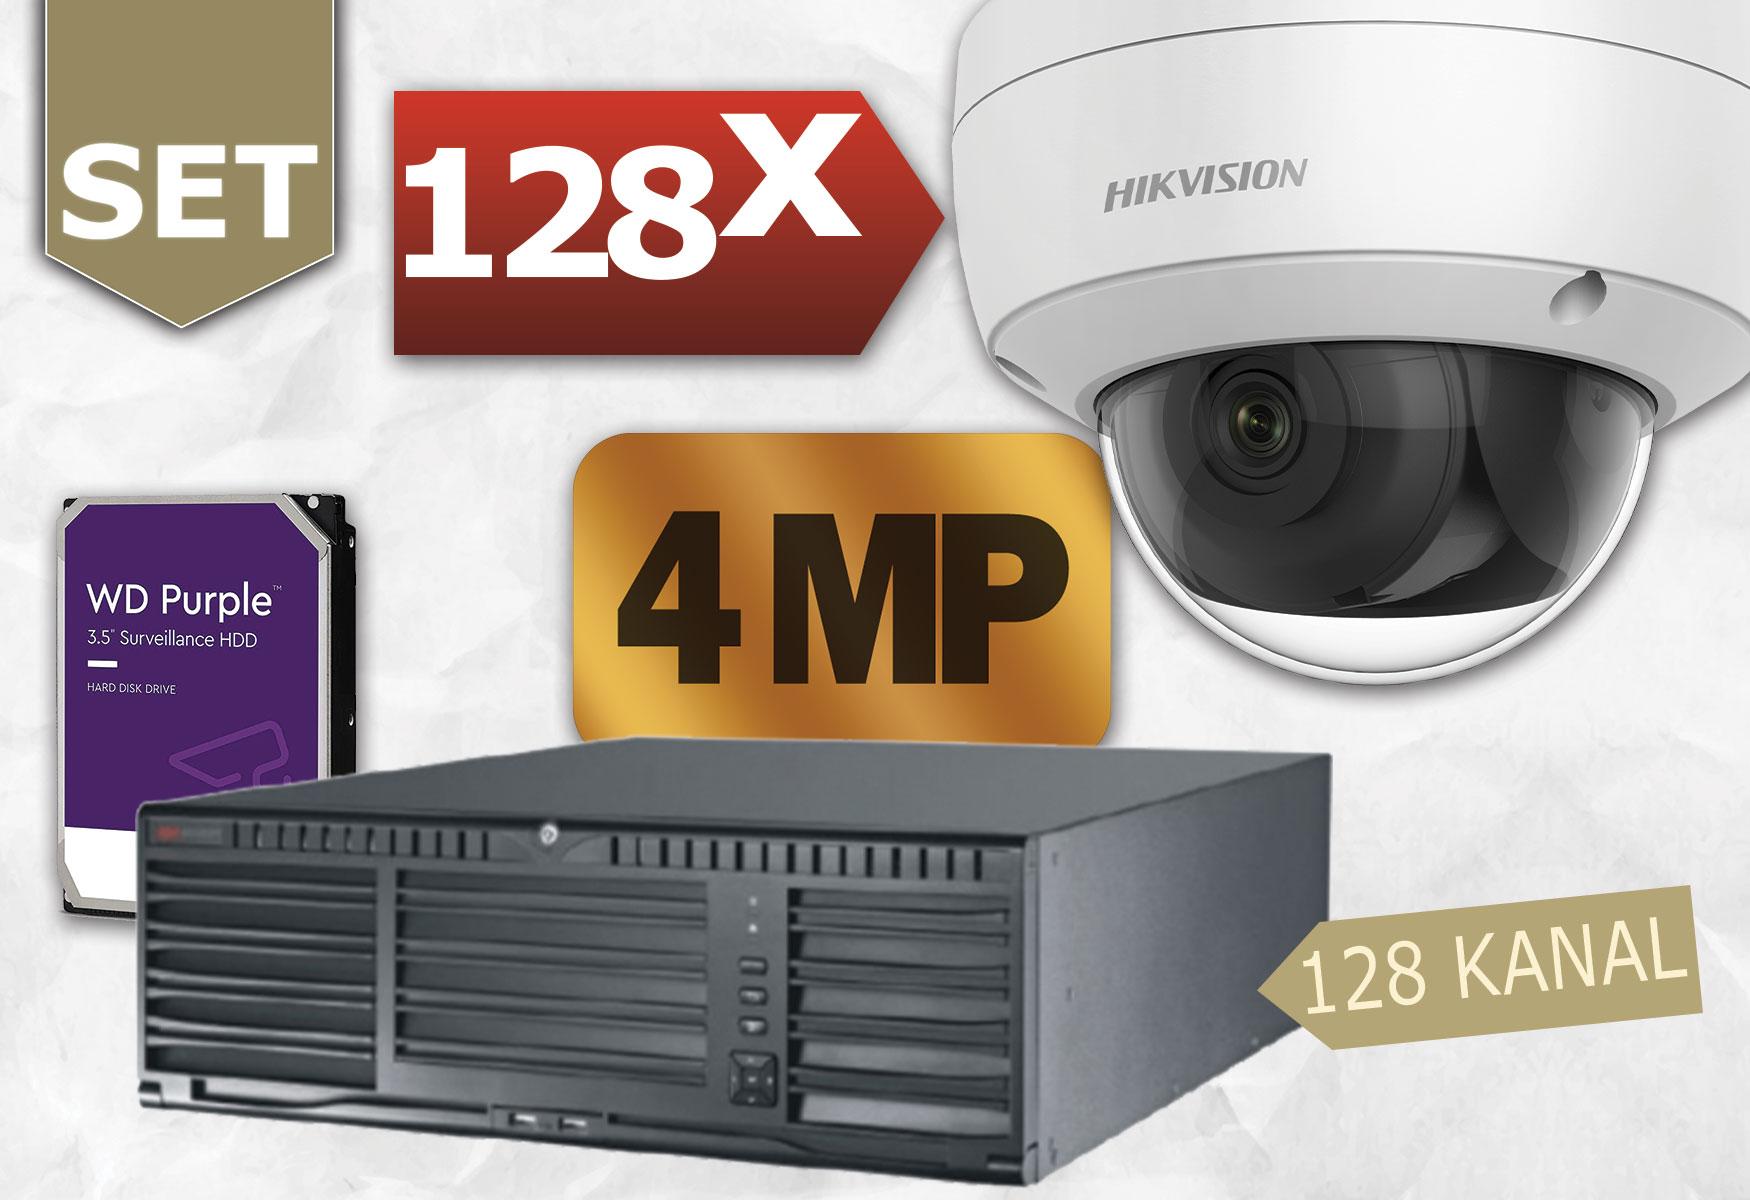 Ueberwachung-128Kanal-128x-Dome-4MP-Produkt-Grafiken-Ueberwachungskamer-Sets-ab-16-Kameras-IP.jpg